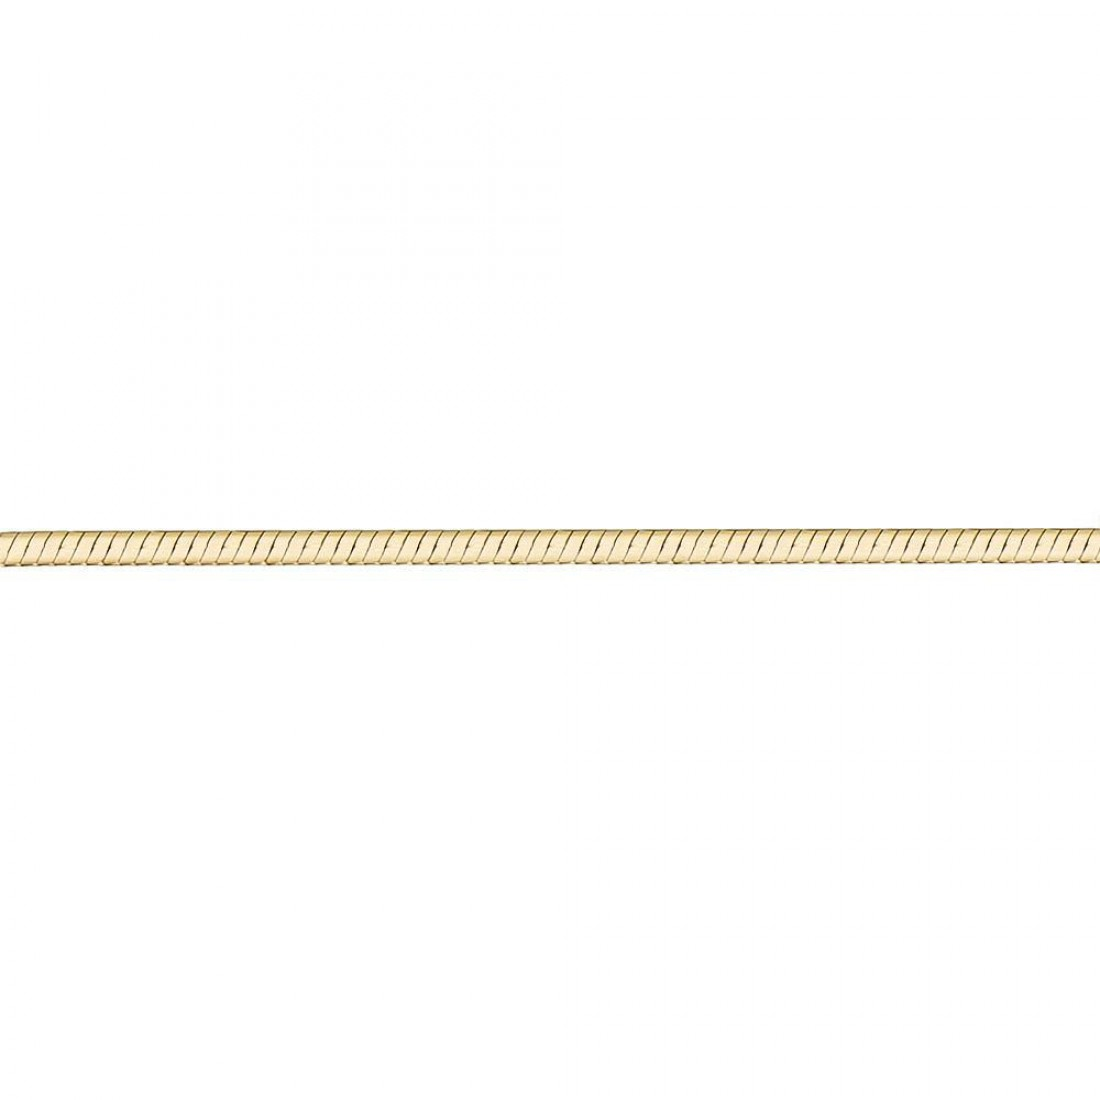 Цепь-жгут из лимонного золота арт. цп125ука1п-а53 цп125ука1п-а53